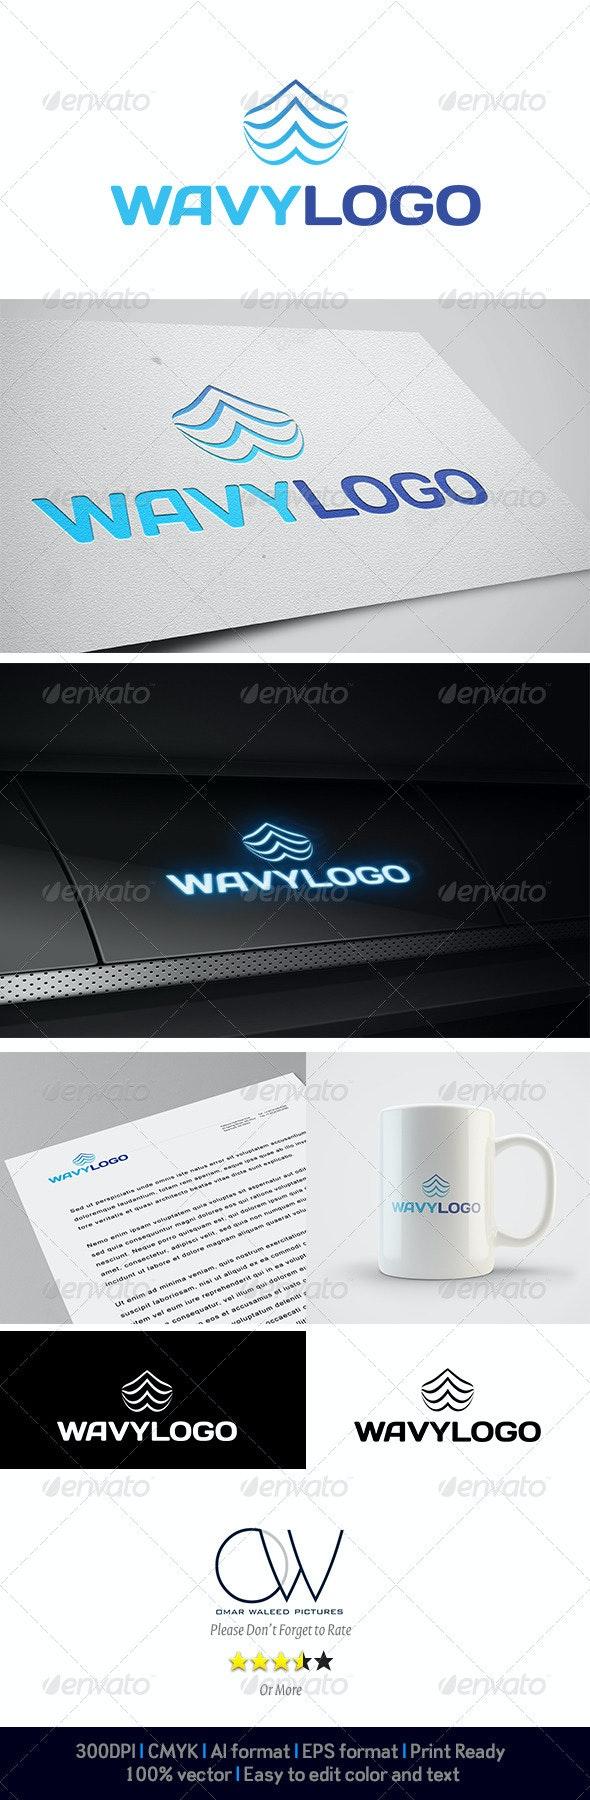 Wavy Logo - Abstract Logo Templates